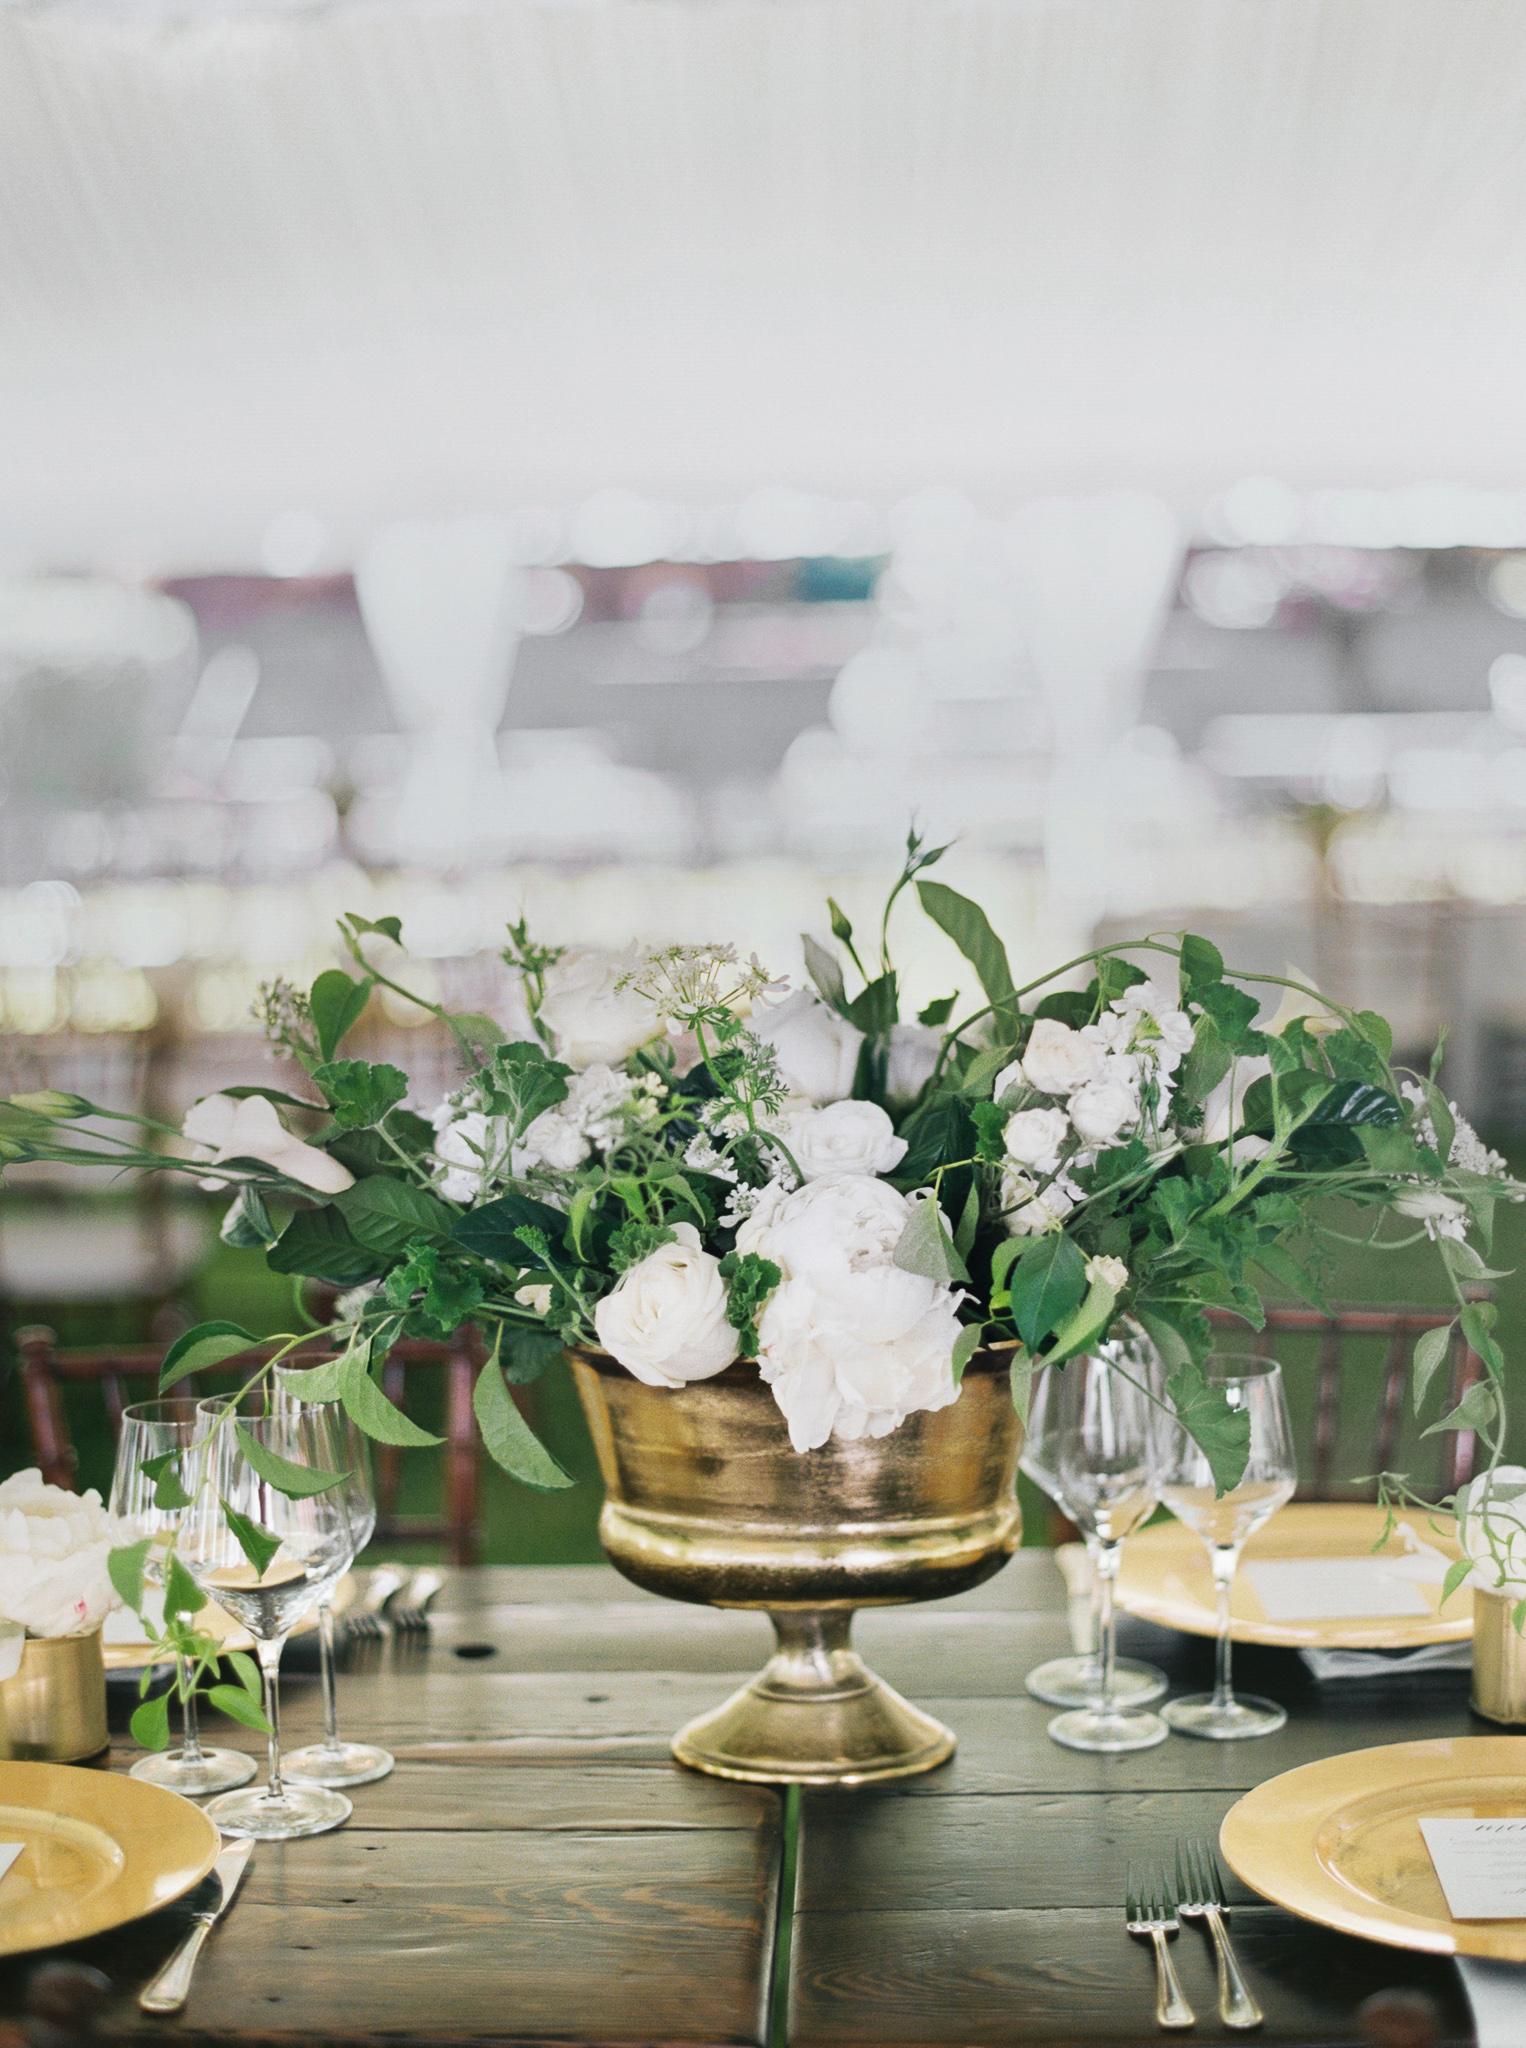 166OutliveCreative_Travel_Photographer_Videographer_Lewis&Clark_Oregon_Elegant_BlackTie_Destination_Wedding.jpg